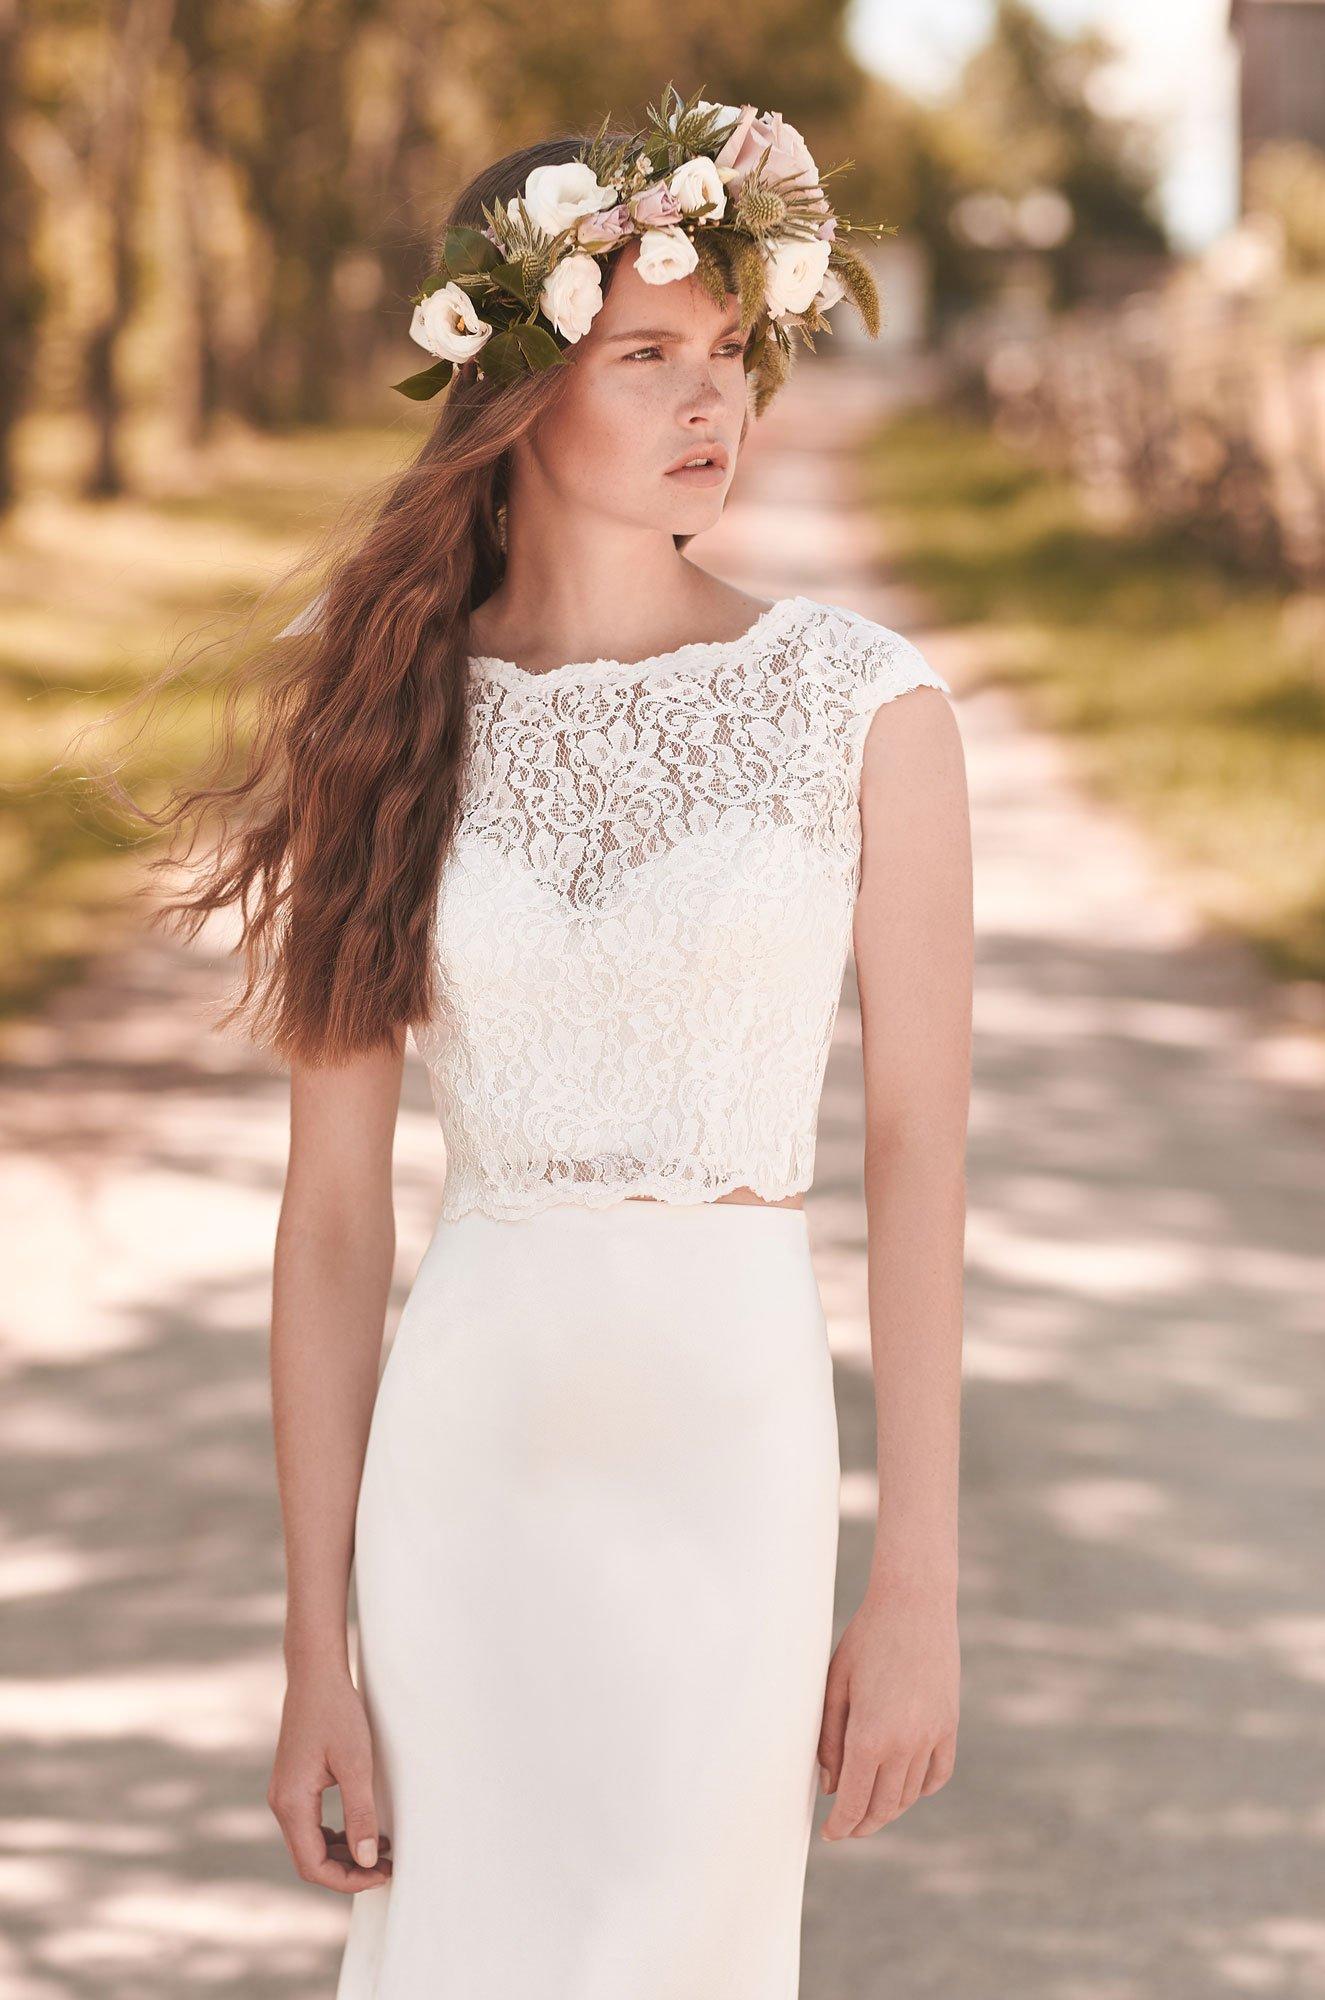 Crop Top Wedding Dress – Style #2053 | Mikaella Bridal